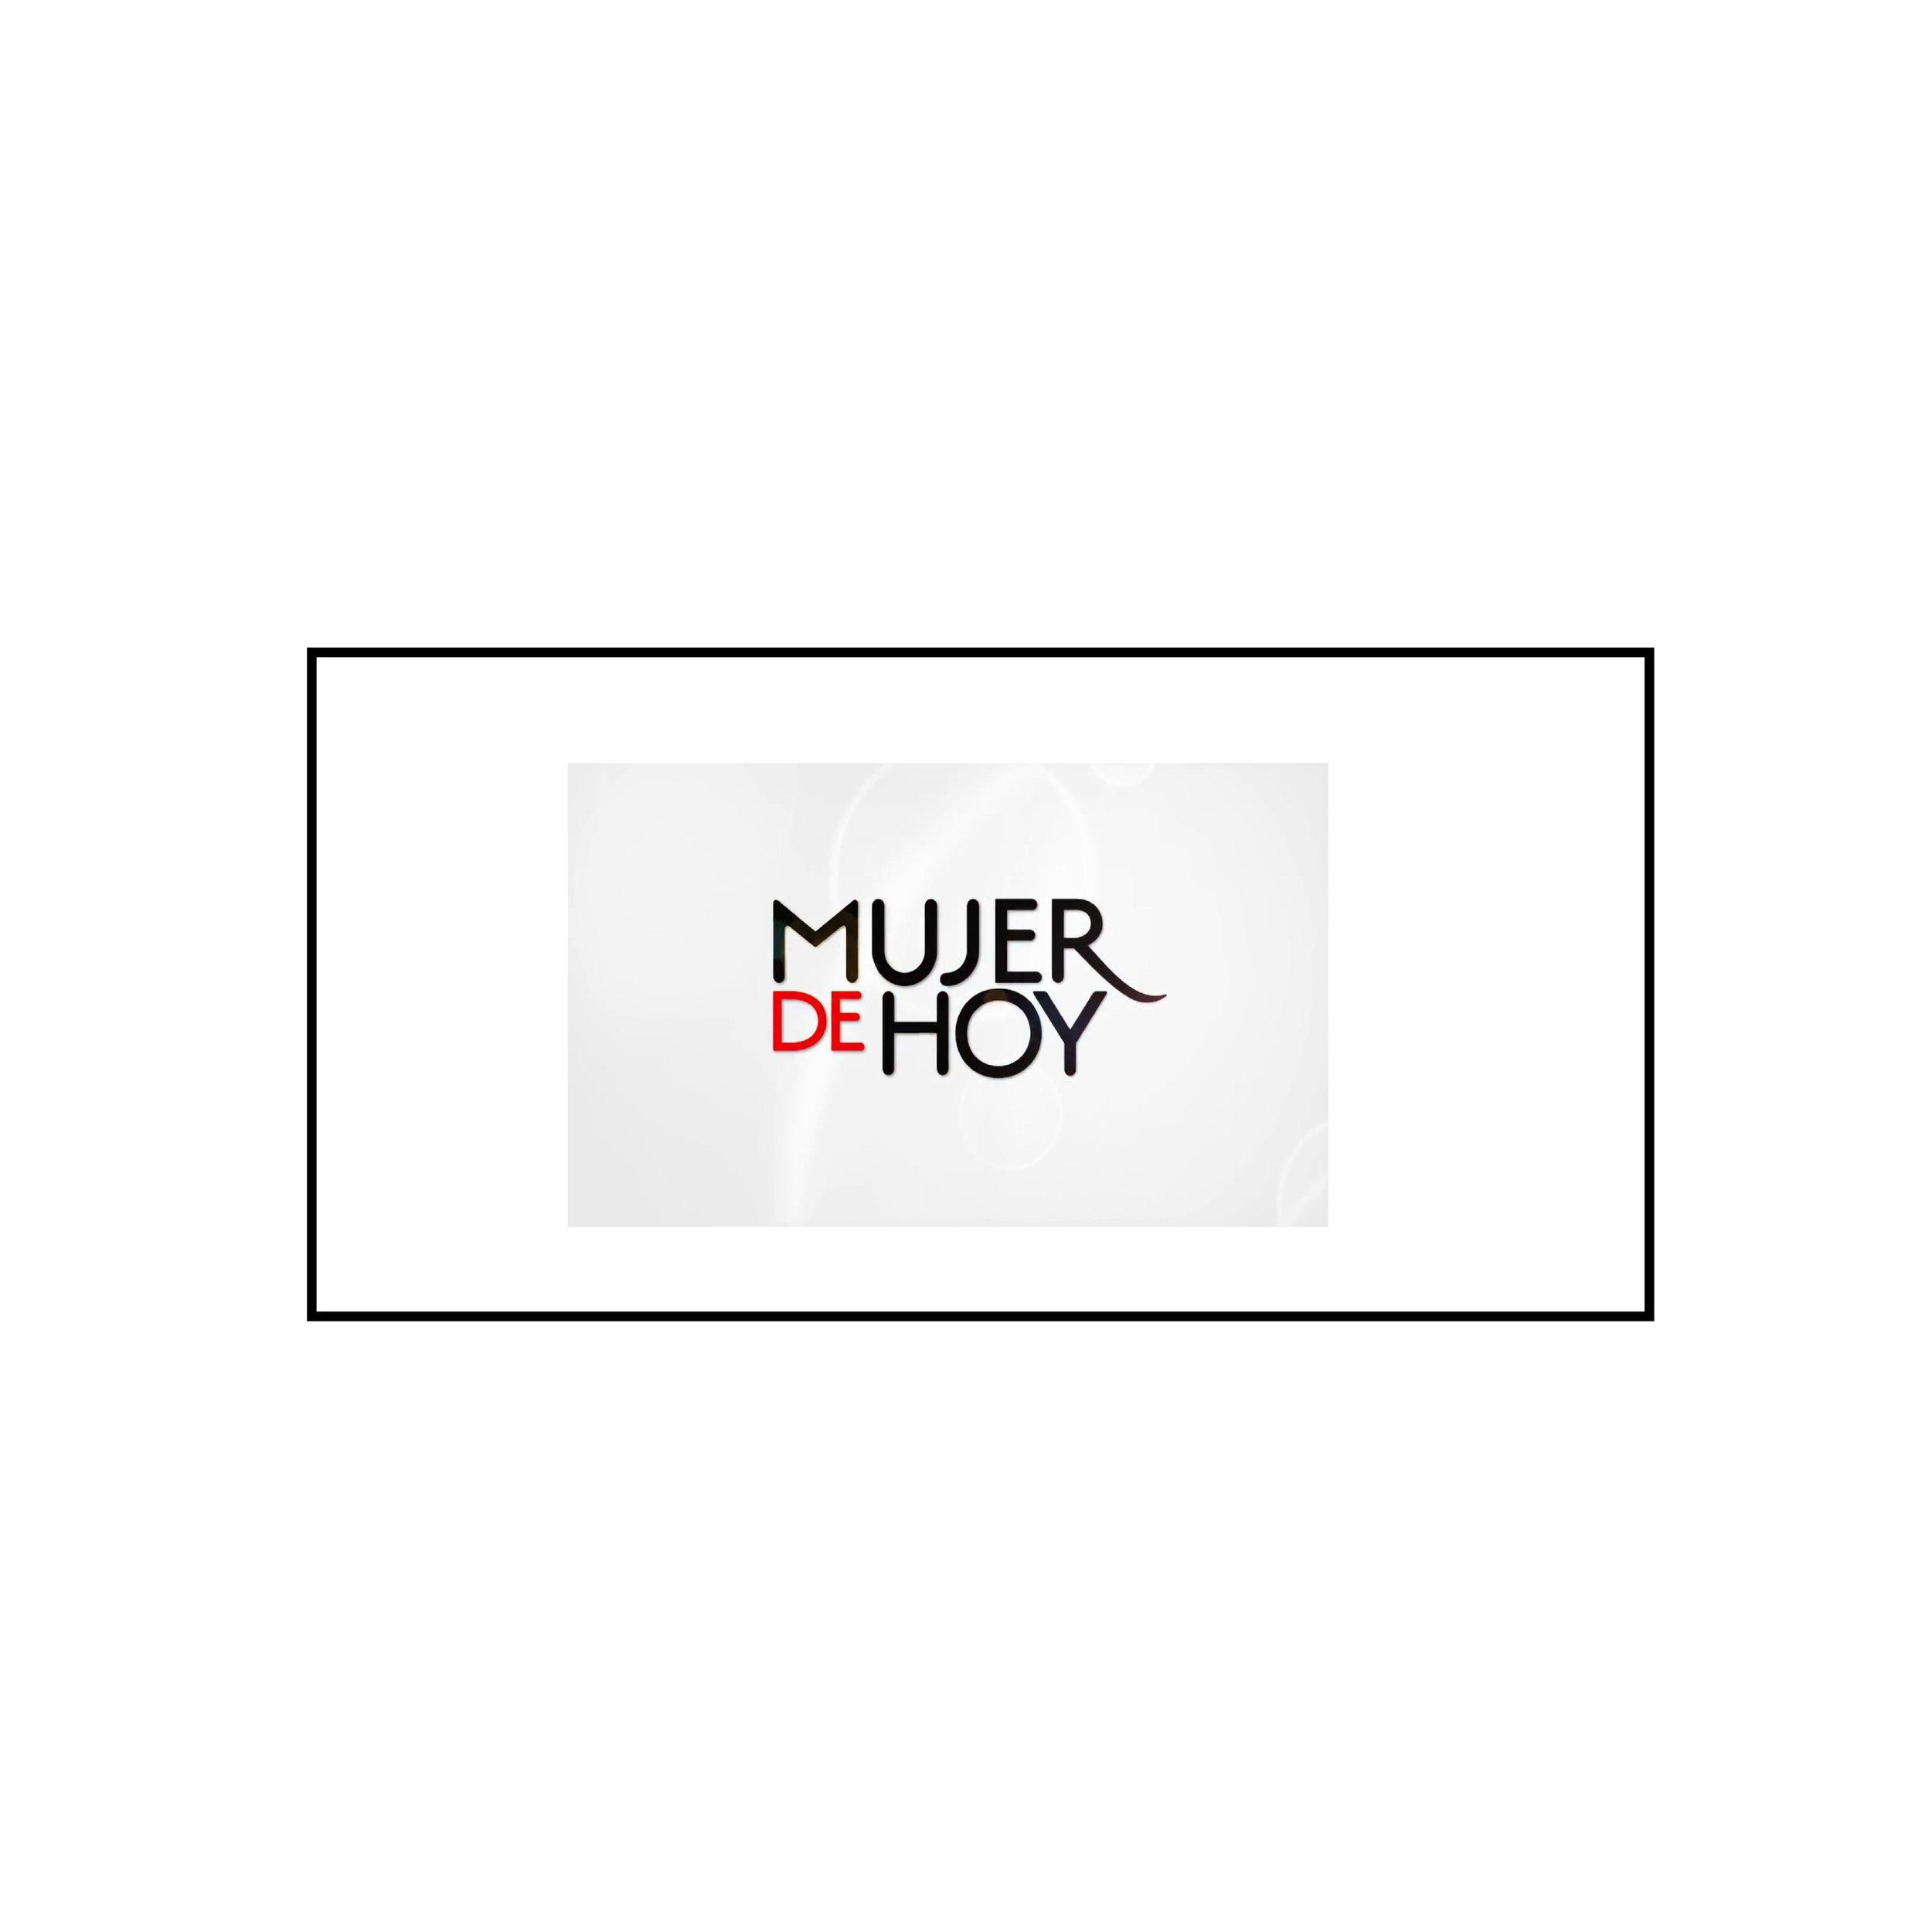 Voices-Mujer de Hoy_MUJER DE HOY.jpg